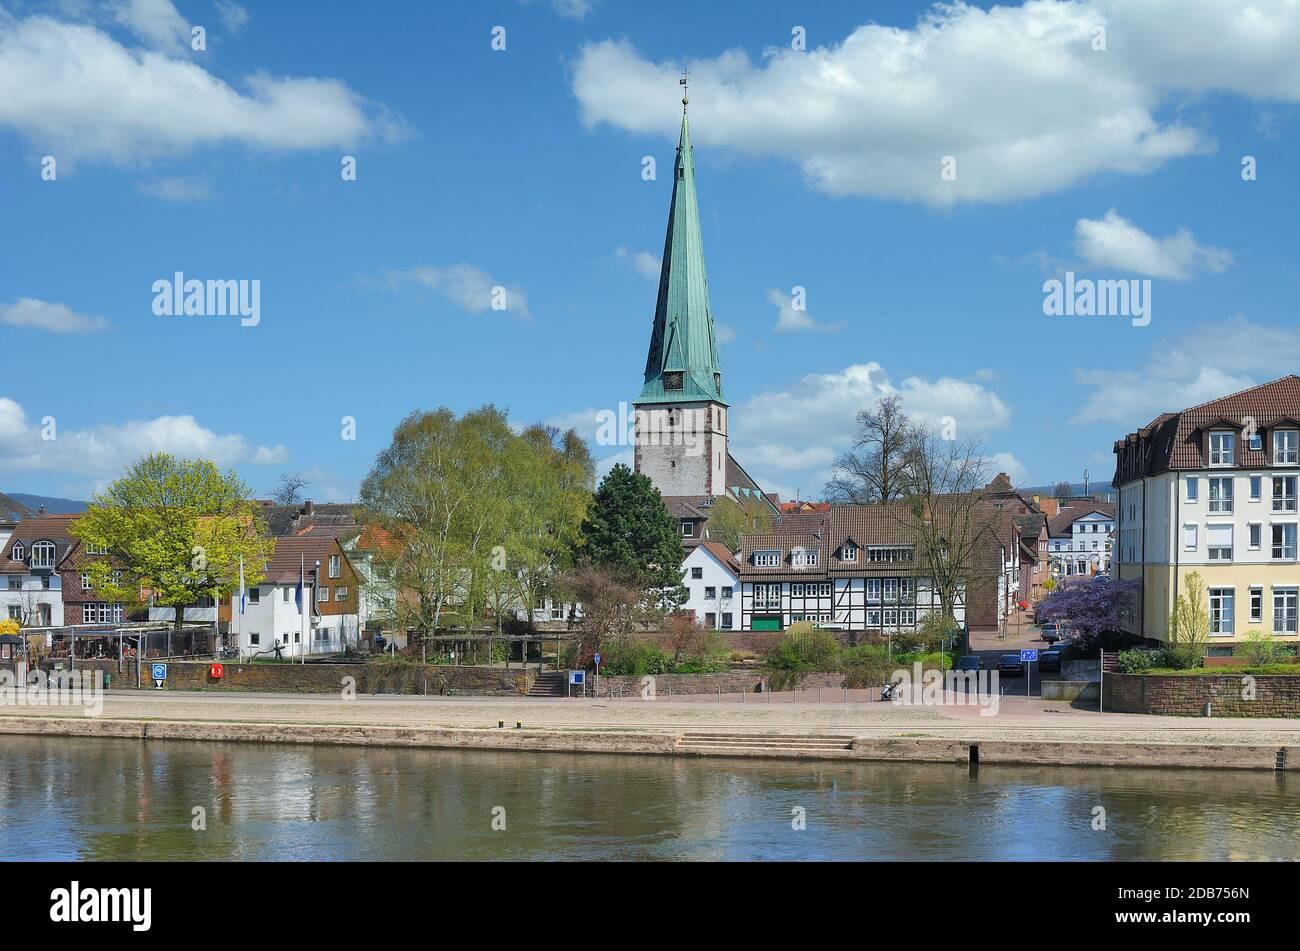 Holzminden à Weser River dans la région de Weserbergland,Basse-saxe,Allemagne Banque D'Images